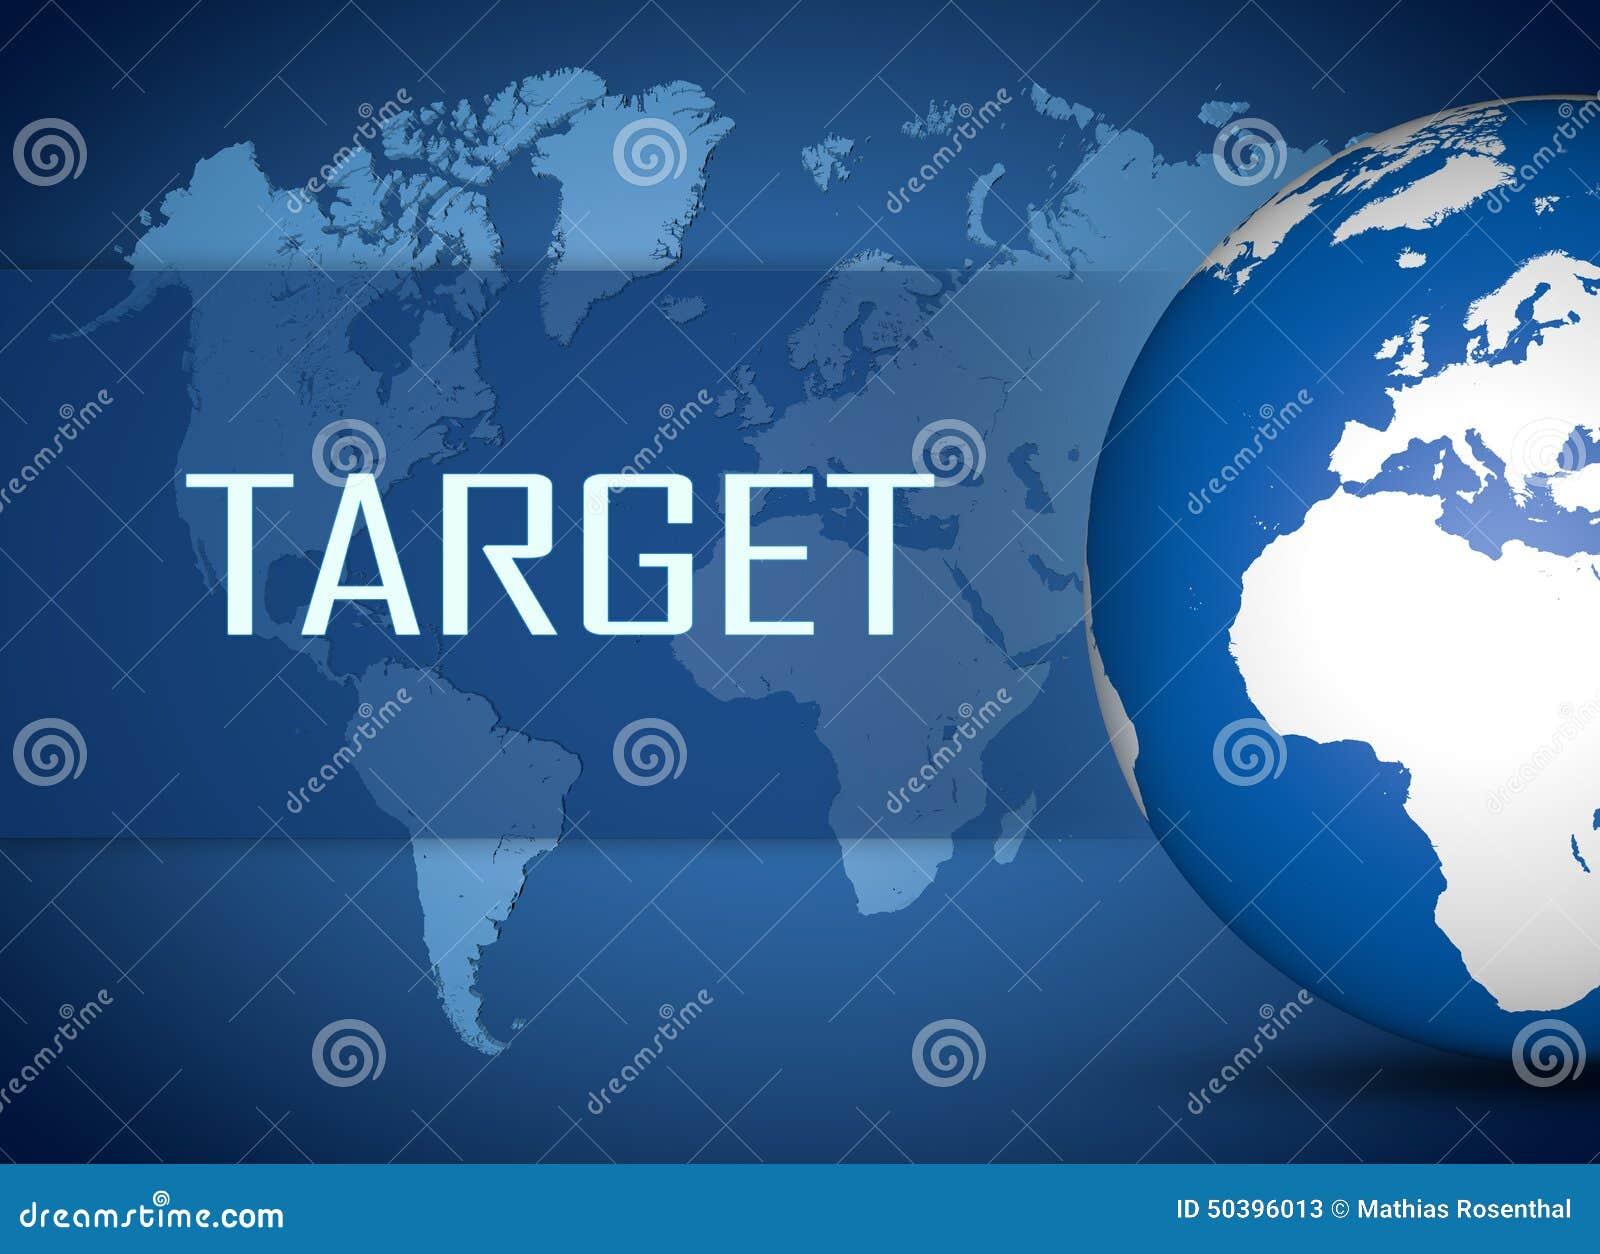 Target Stock Illustration Image 50396013